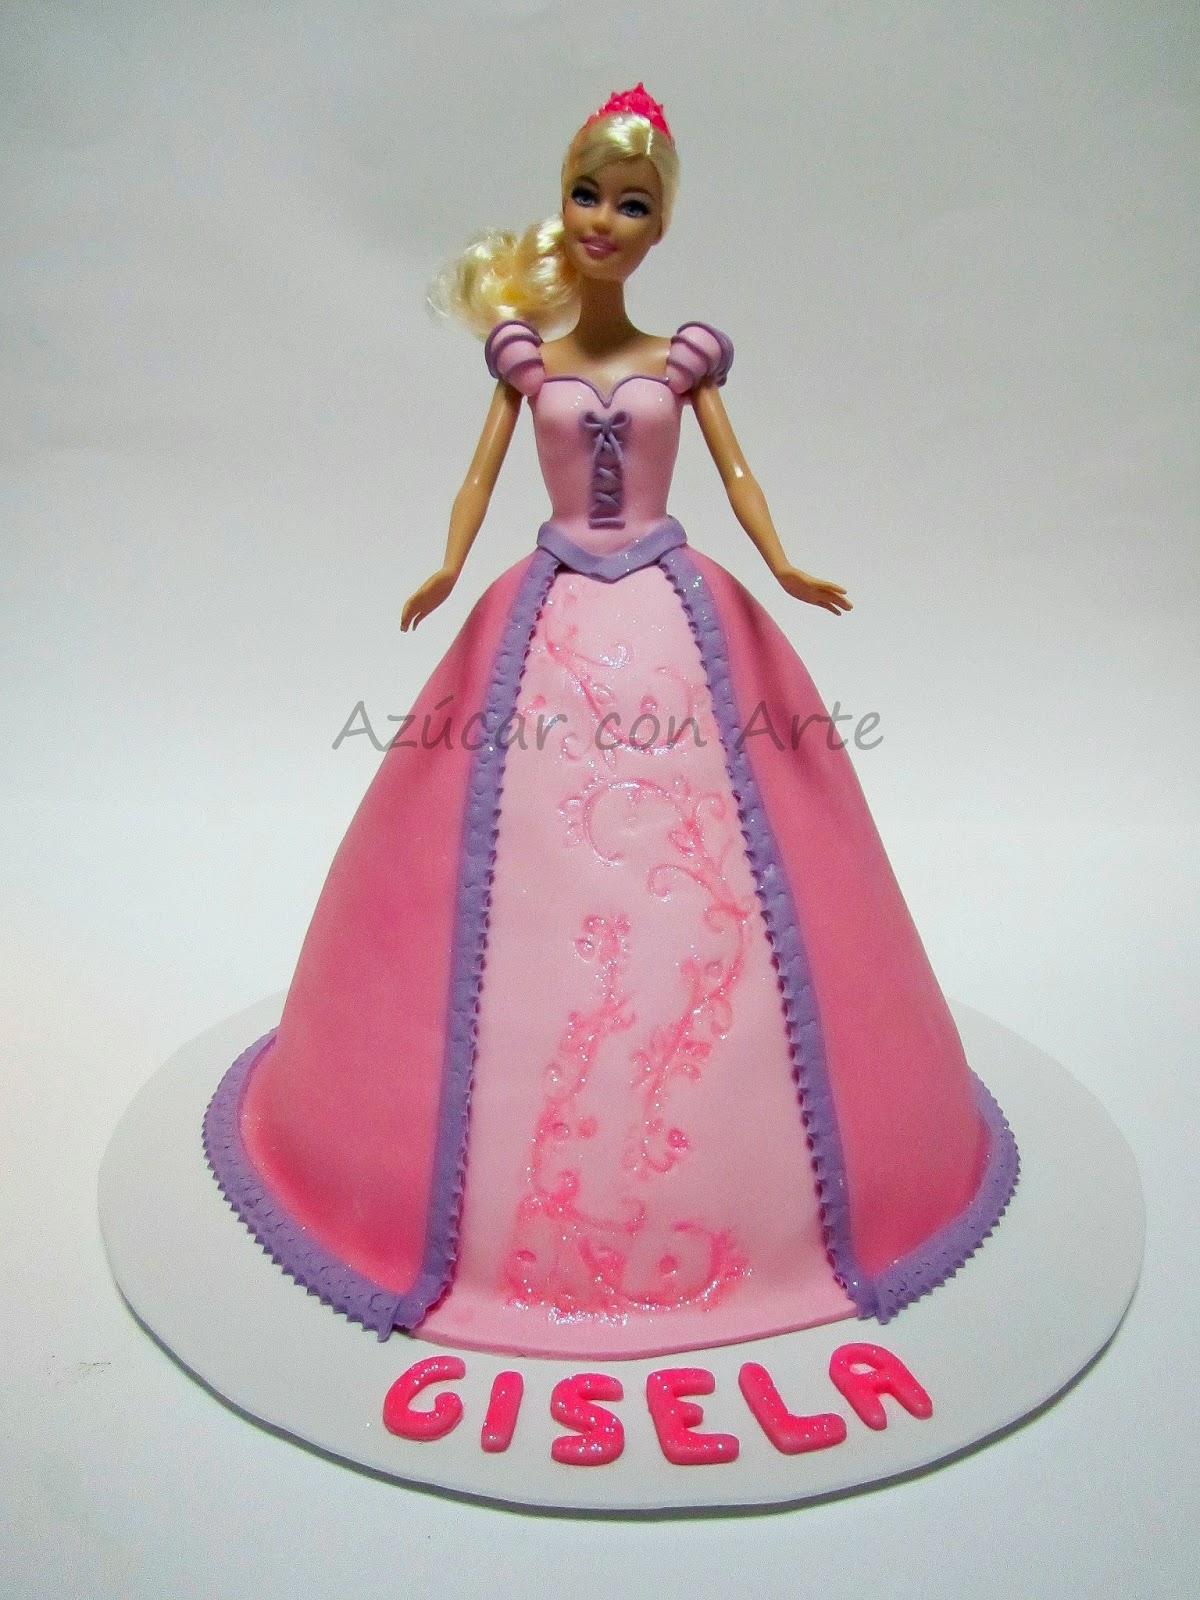 Tarta rapunzel, rapunzel cake, tarta sin gluten, gluten free cake| azucar con arte